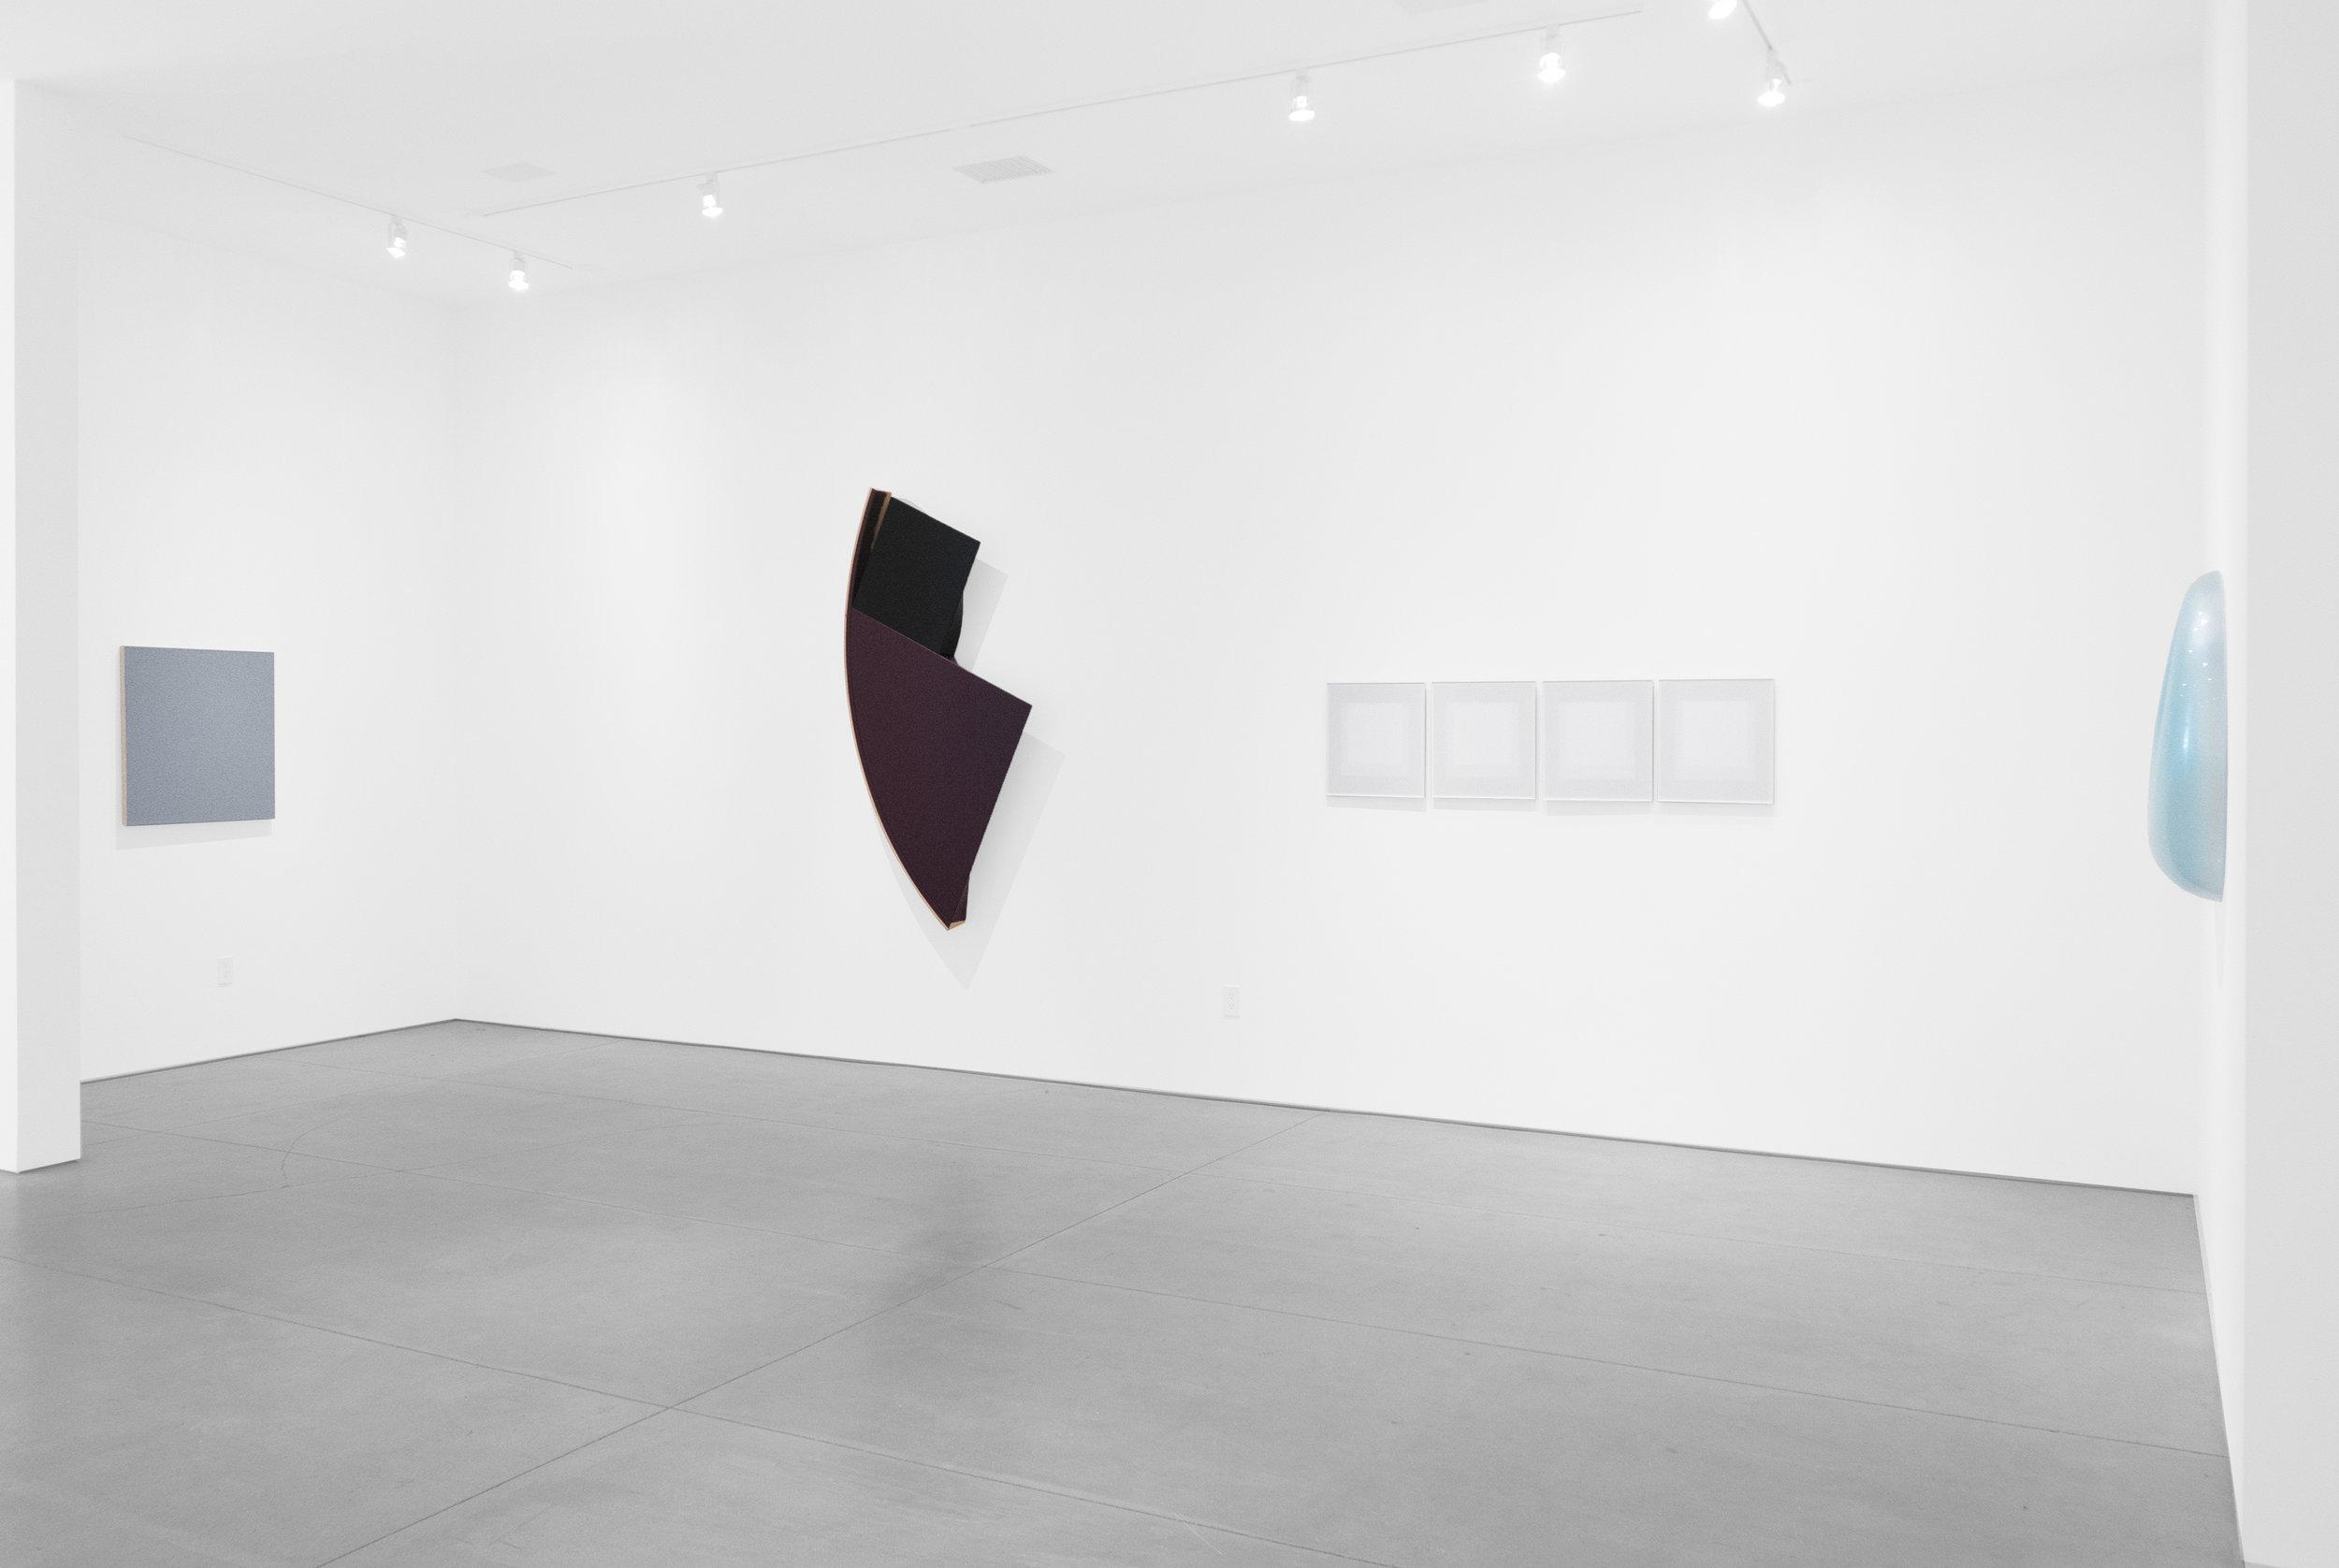 25 Years_Peter Blake Gallery_2019_Installation View_17.jpg